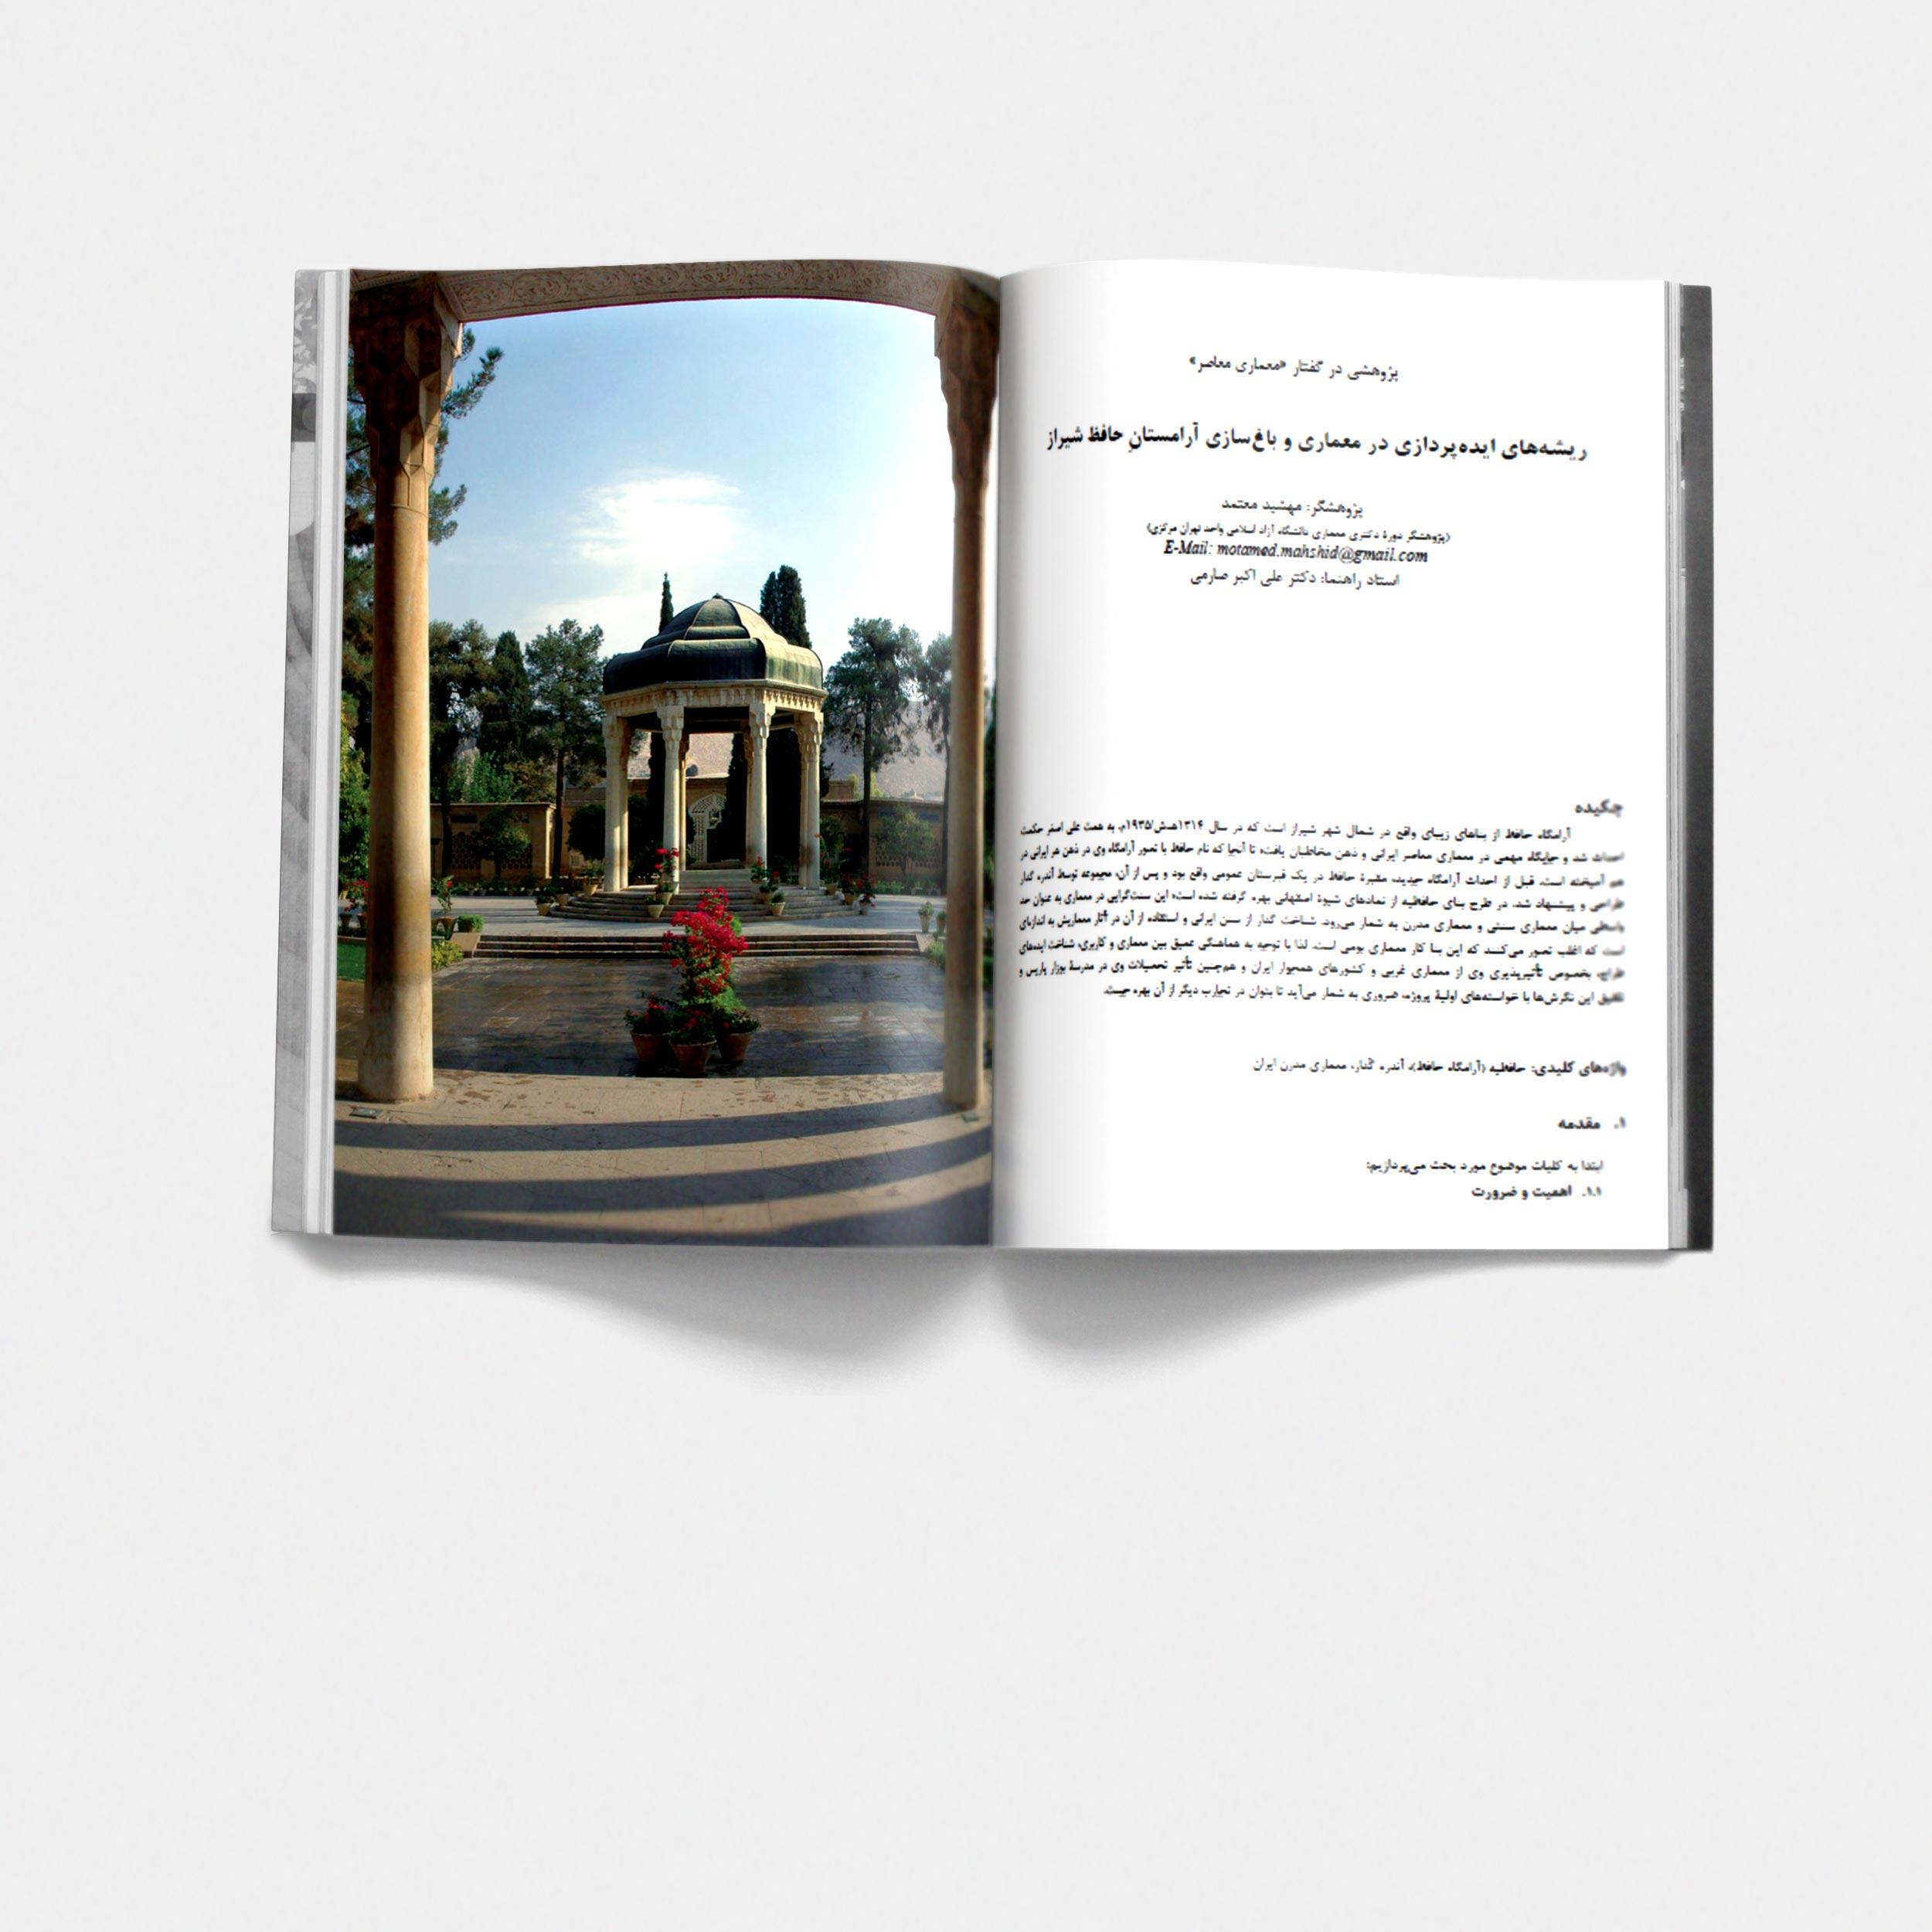 hafez tomb,معماری حافظیه,حافظیه, آرامگاه حافظ, مقبره حافظ, آندره گدار, پلان حافظیه, نقشه حافظیه,hafez tomb architecture,hafez mausoleum architecture,hafez mausoleum,hafez shrine,